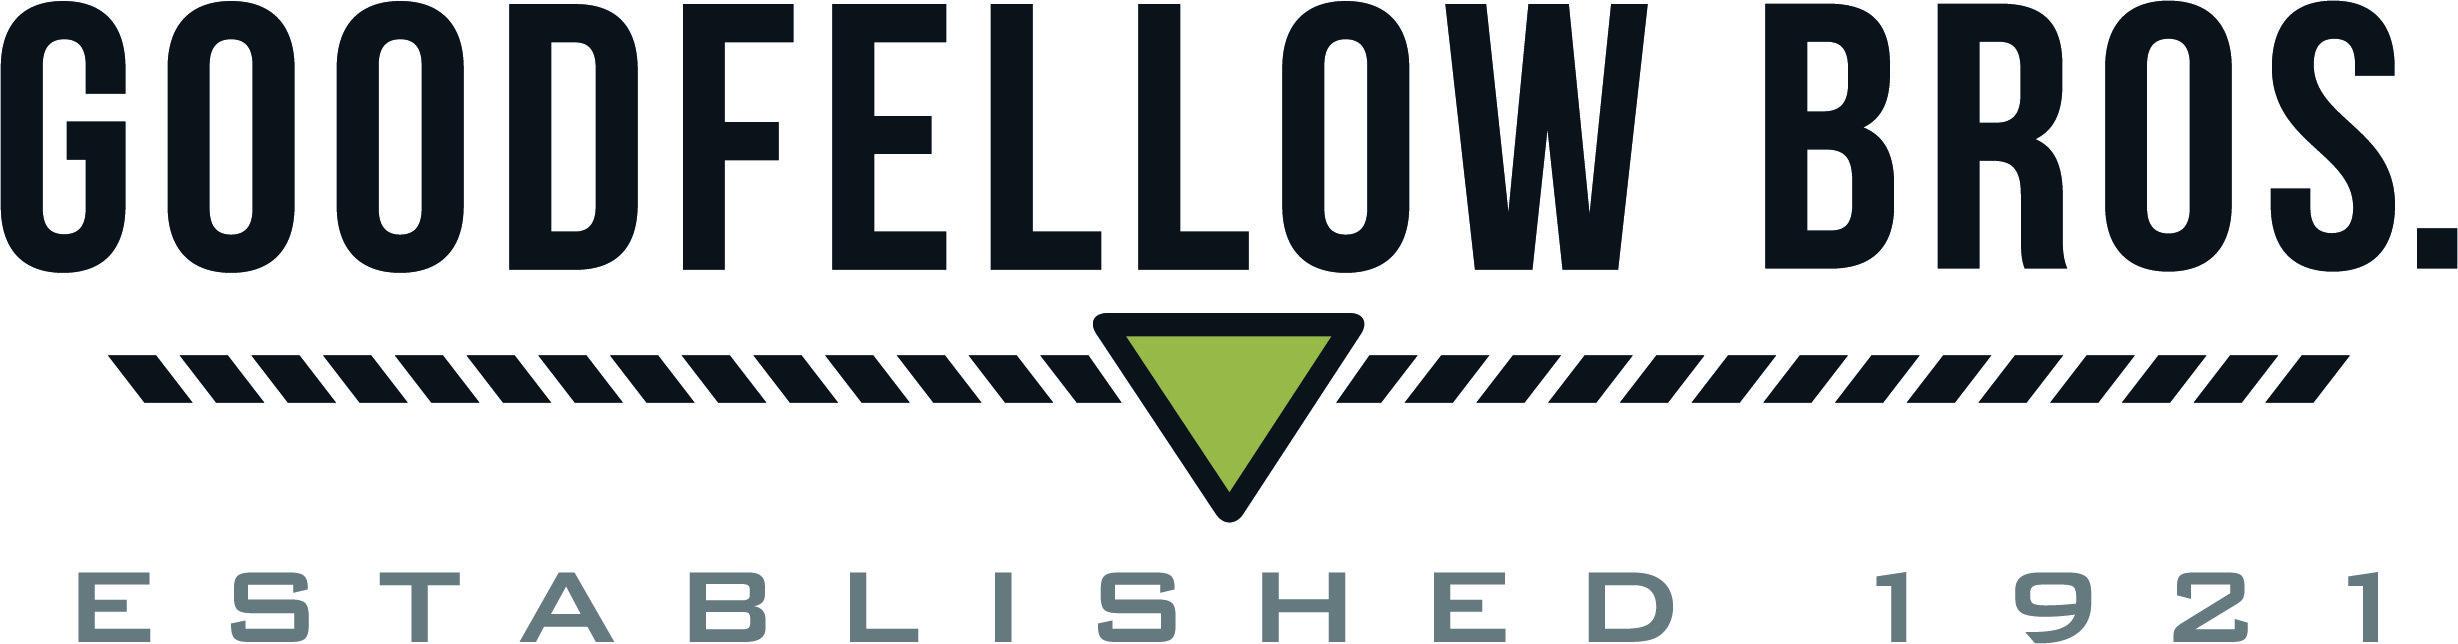 Goodfellow Bros logo.jpg